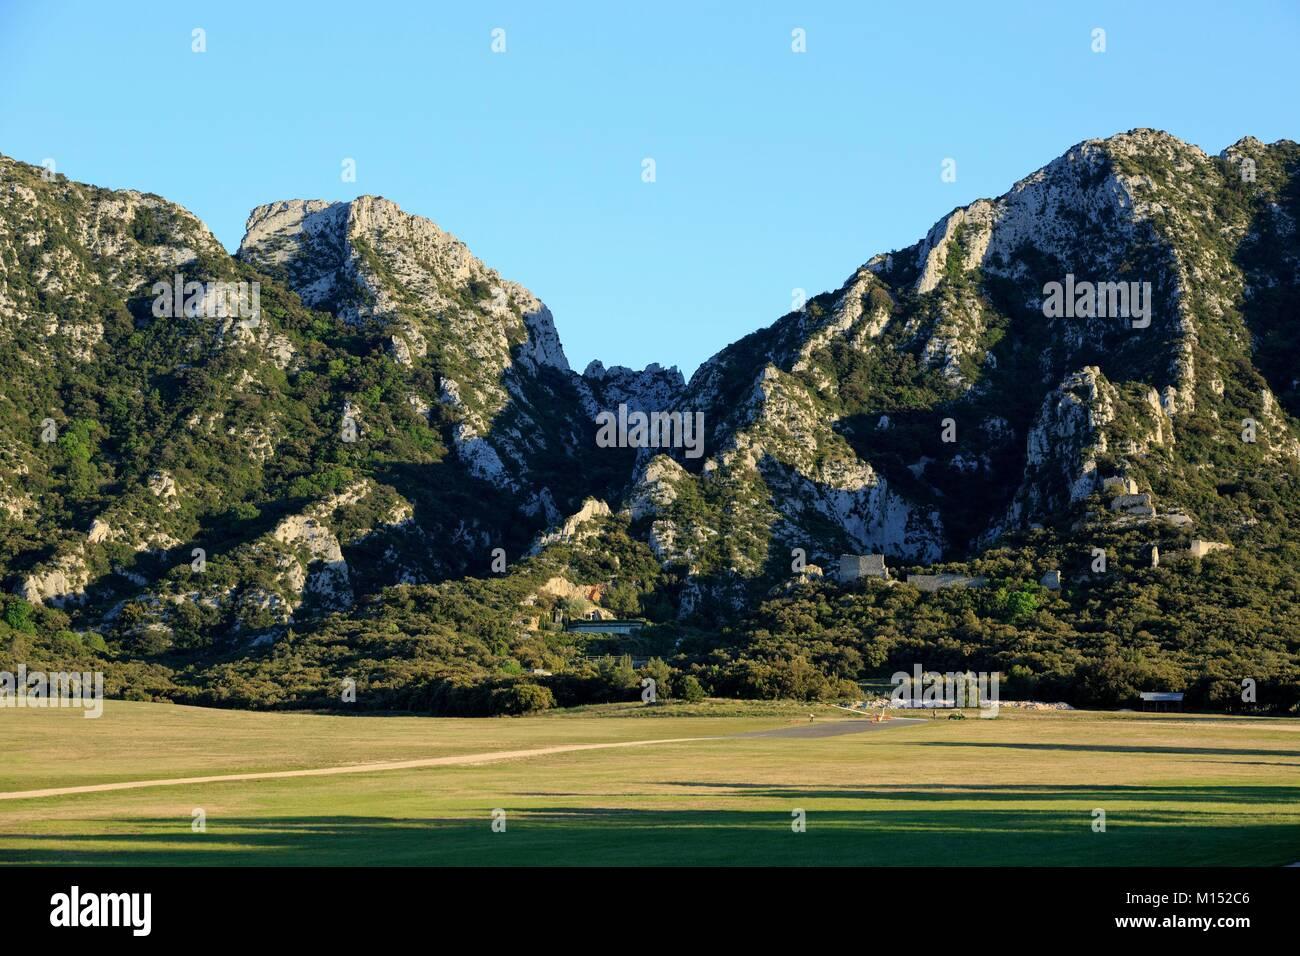 Alpilles Natural Regional Park